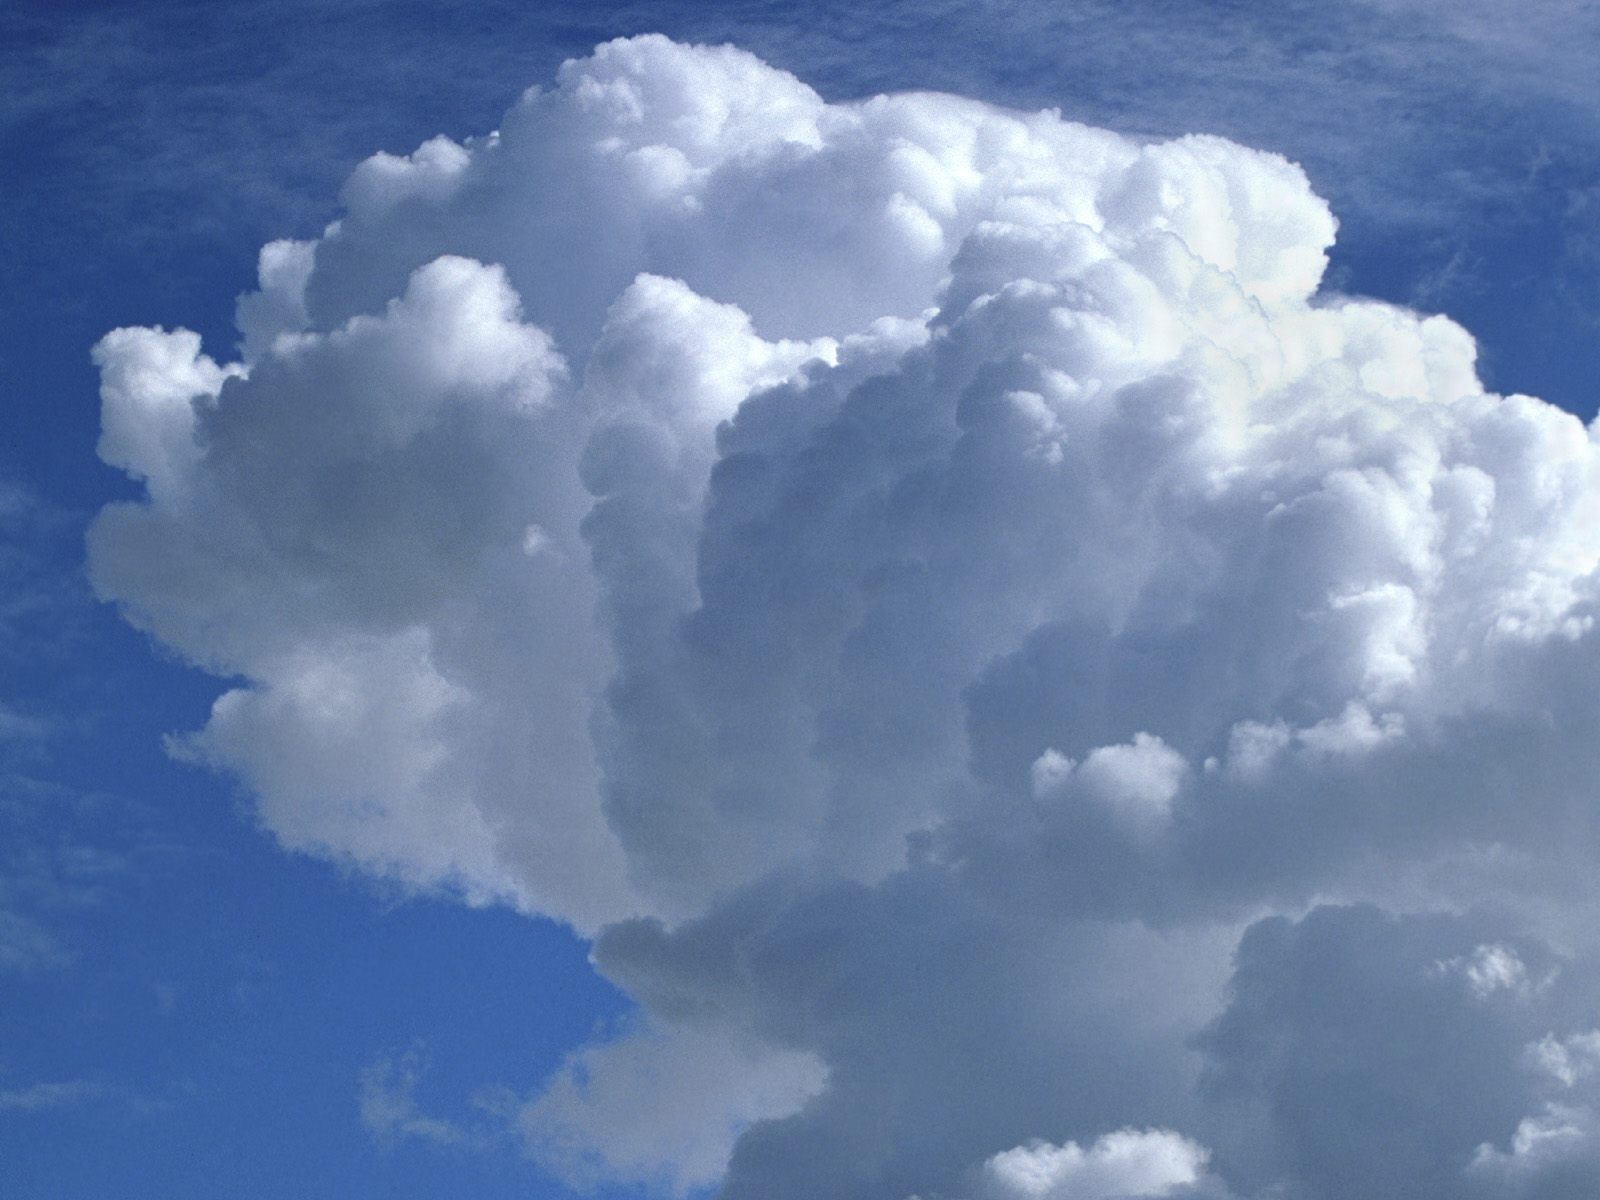 http://3.bp.blogspot.com/_lZ0PjAyUf4I/S9aWkIxWl_I/AAAAAAAADkg/GK0luSfyLhc/s1600/cloud%2B(10).jpg